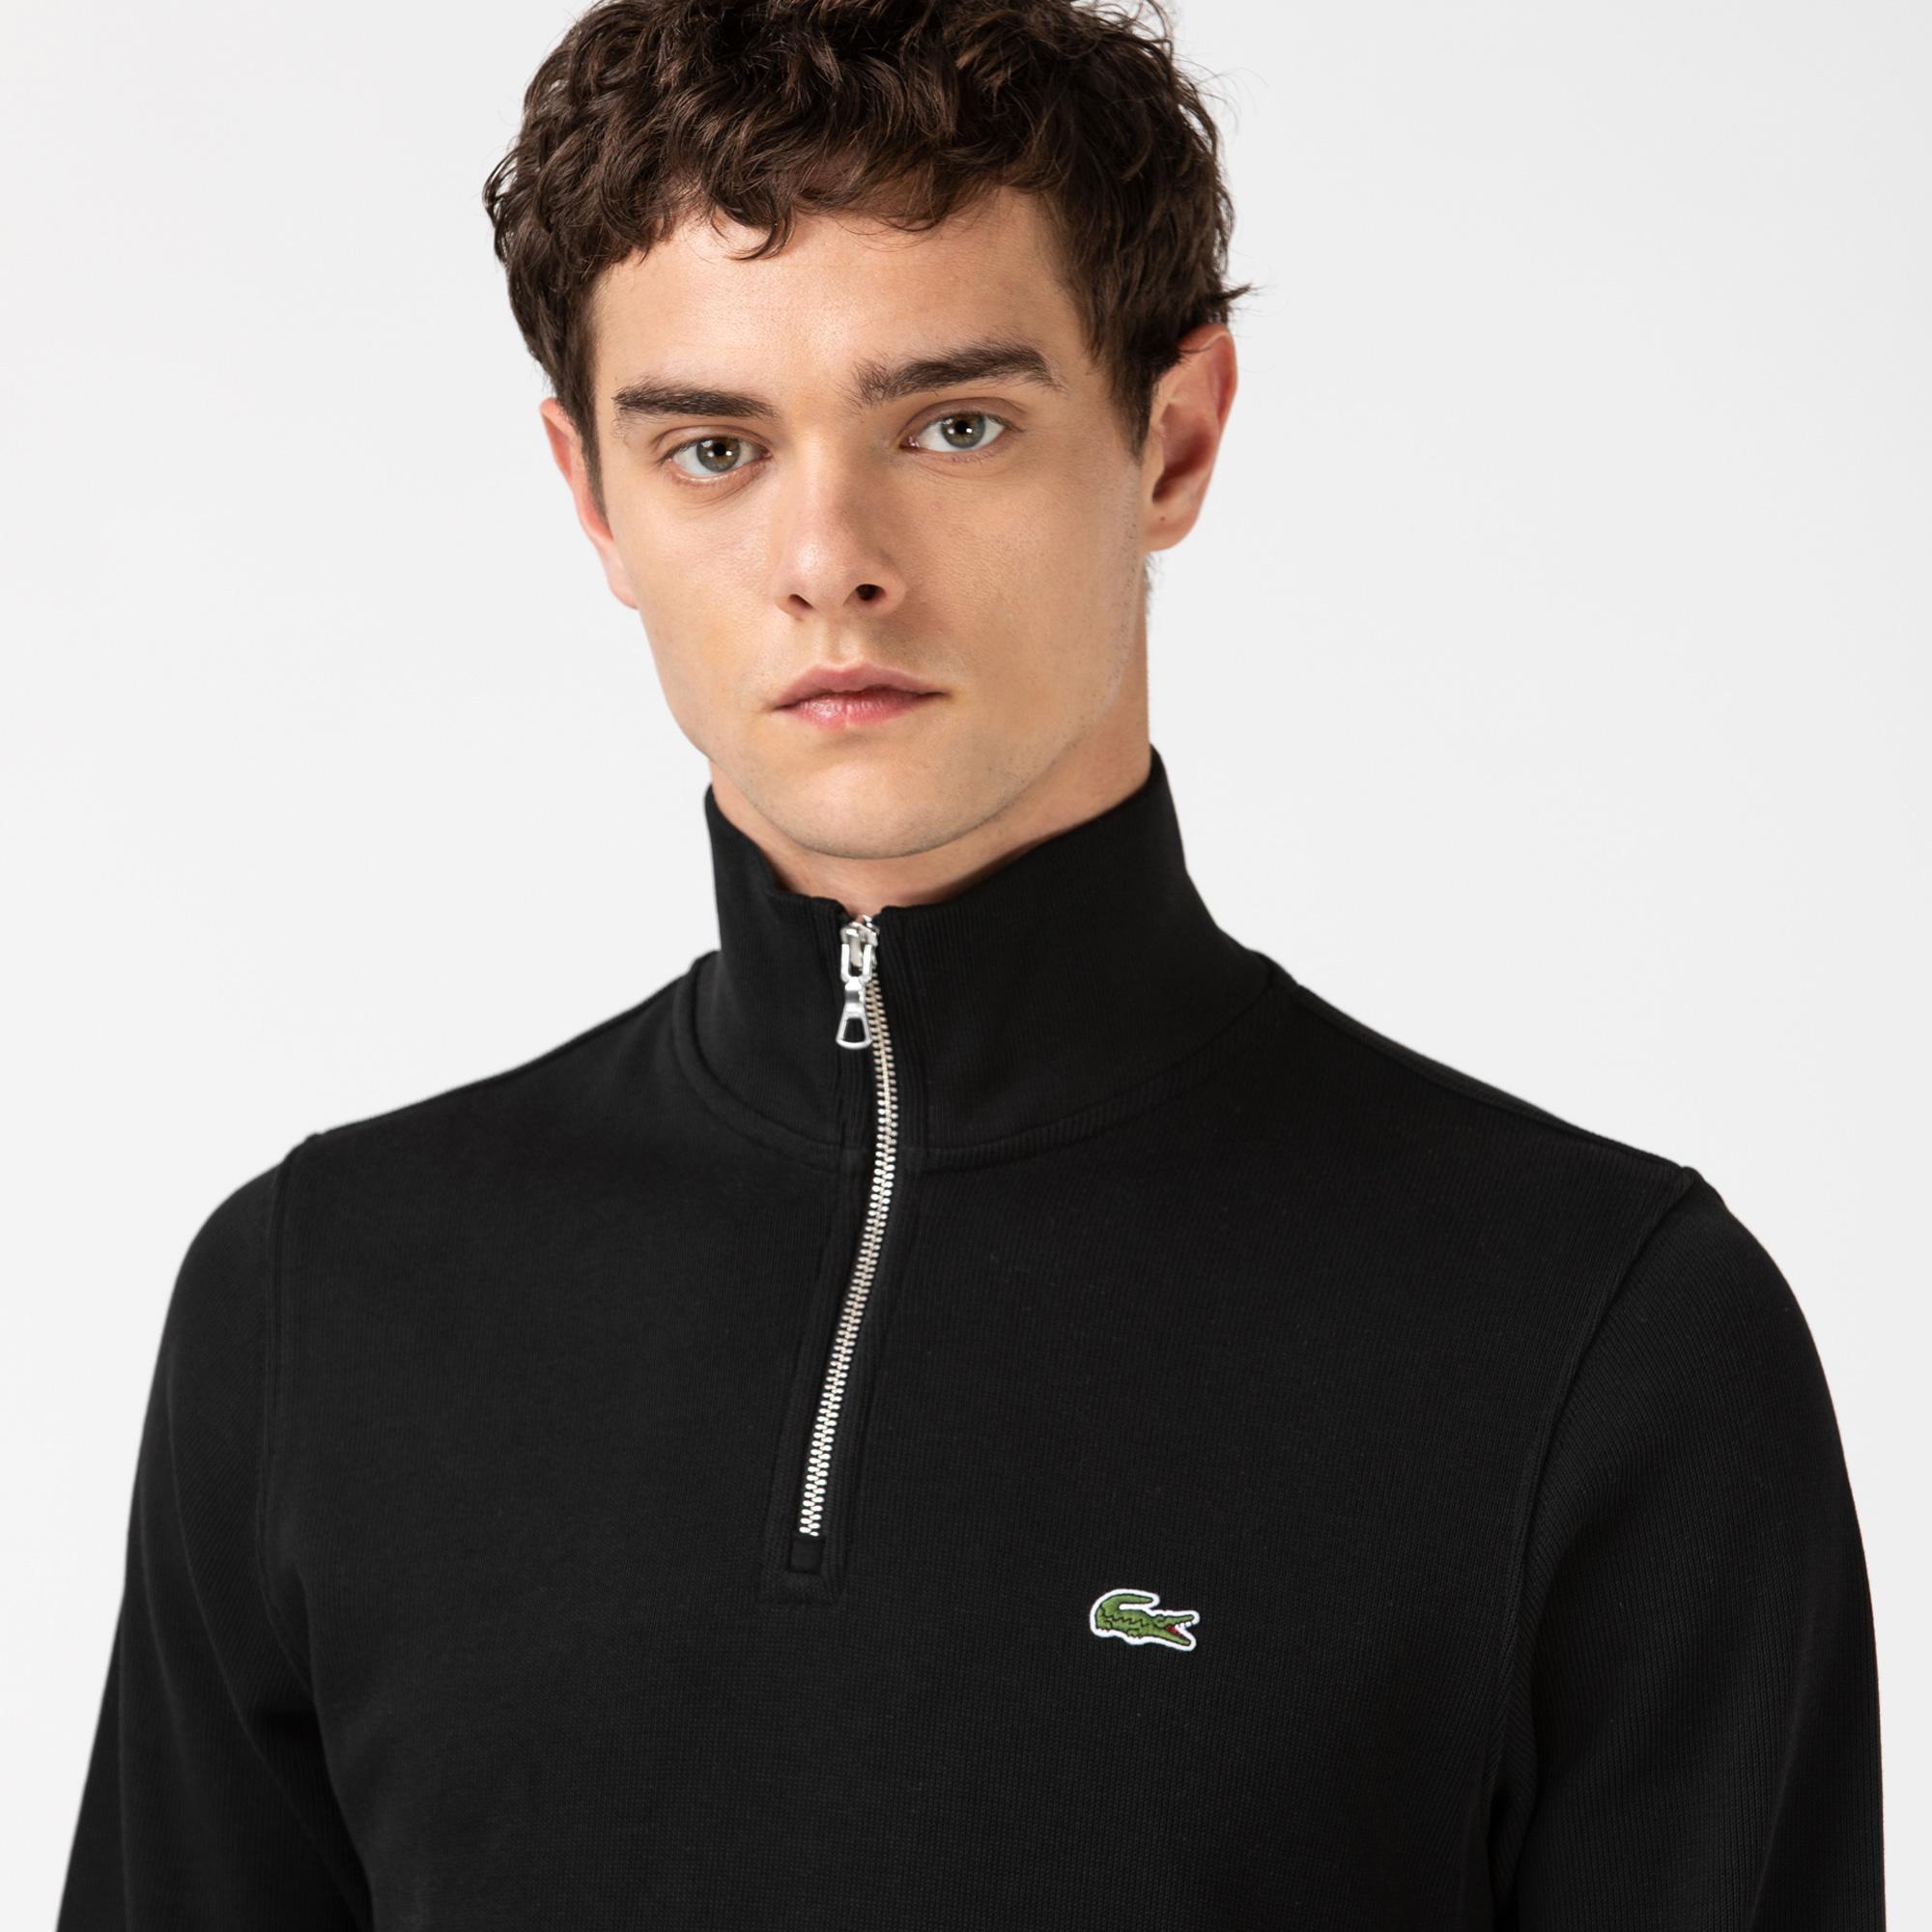 Lacoste Men's Zippered Stand-Up Collar Cotton Sweatshirt